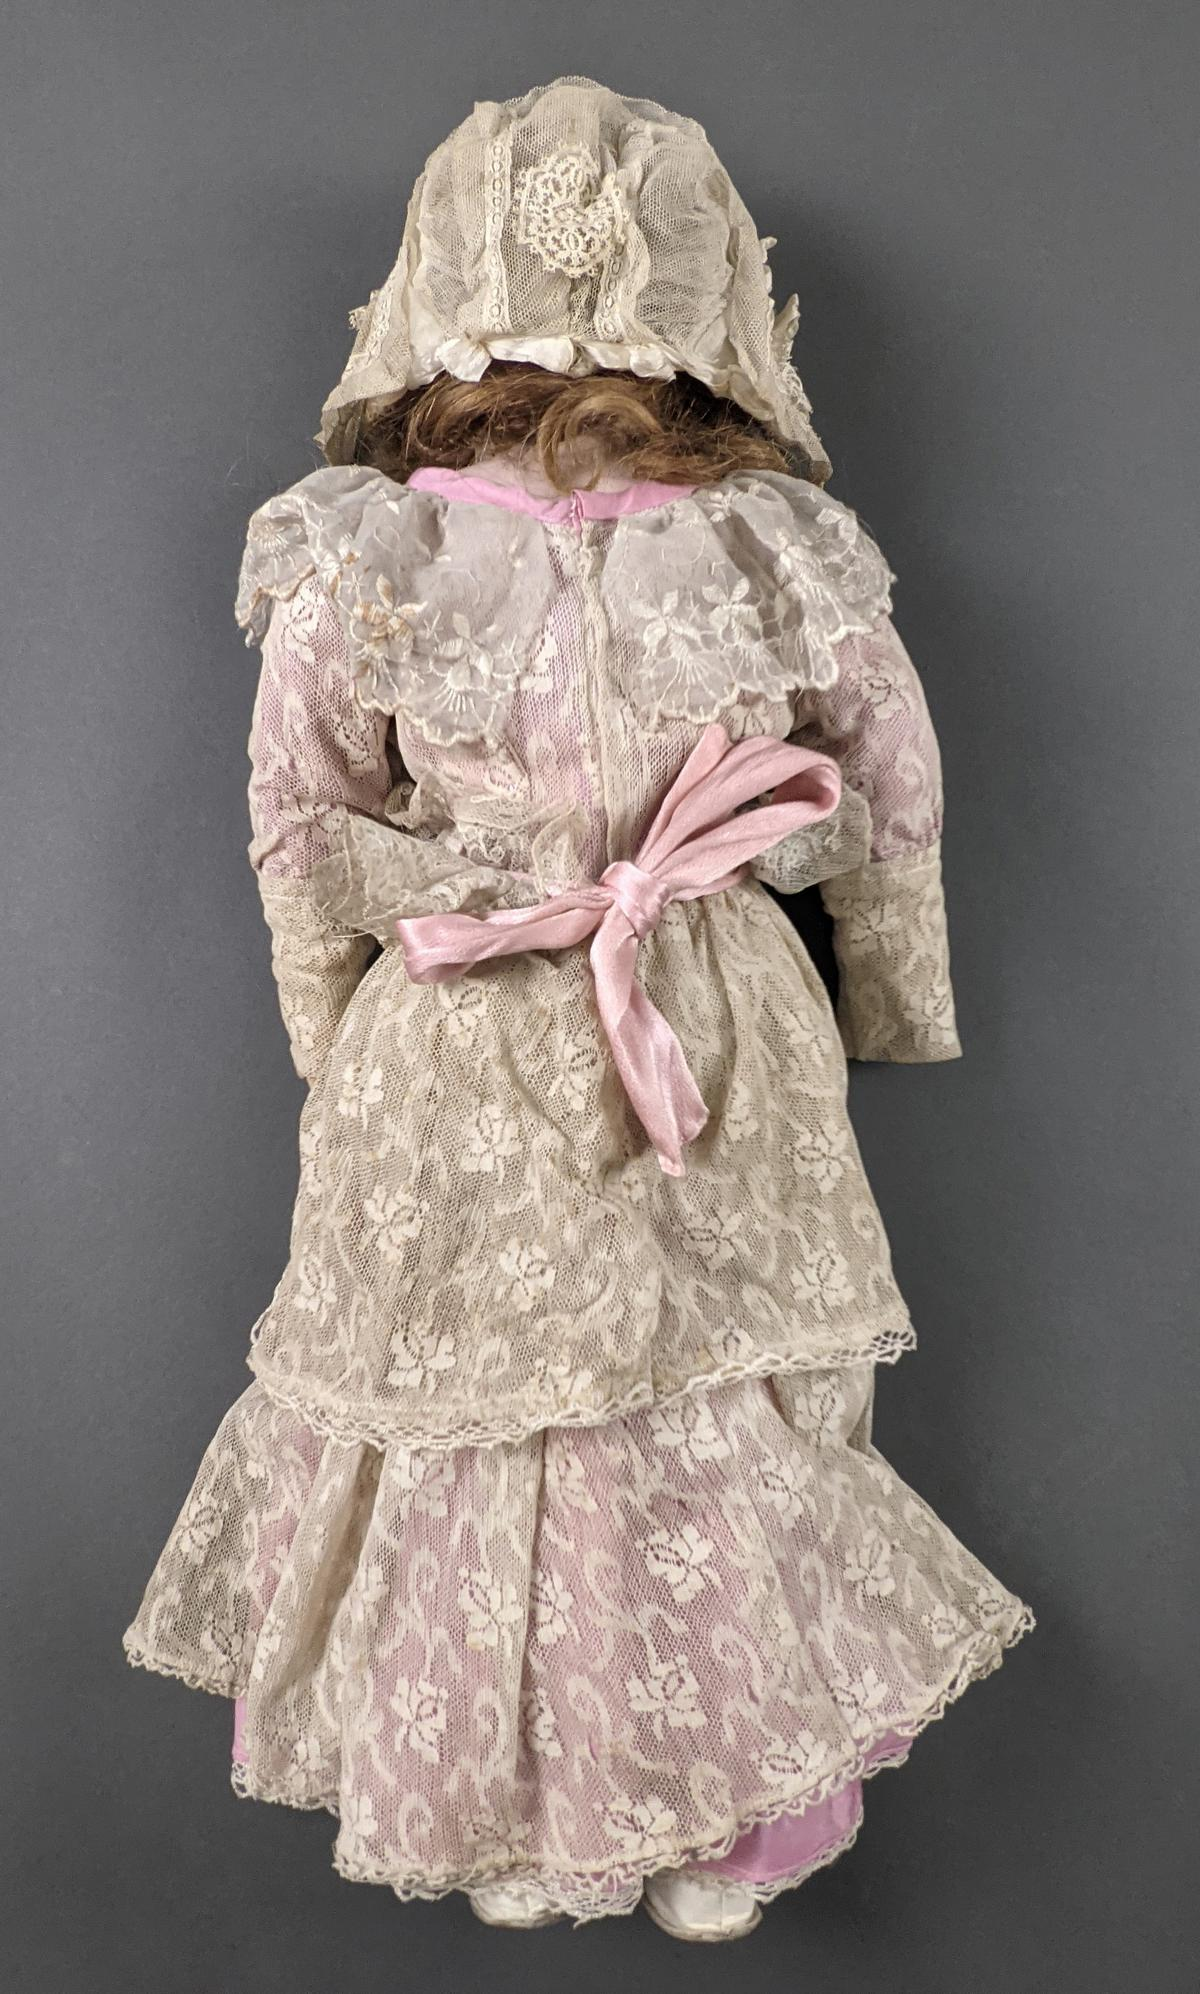 Porzellan-Schulterkopf-Puppe, gemarkt P. H. 5 1904-3